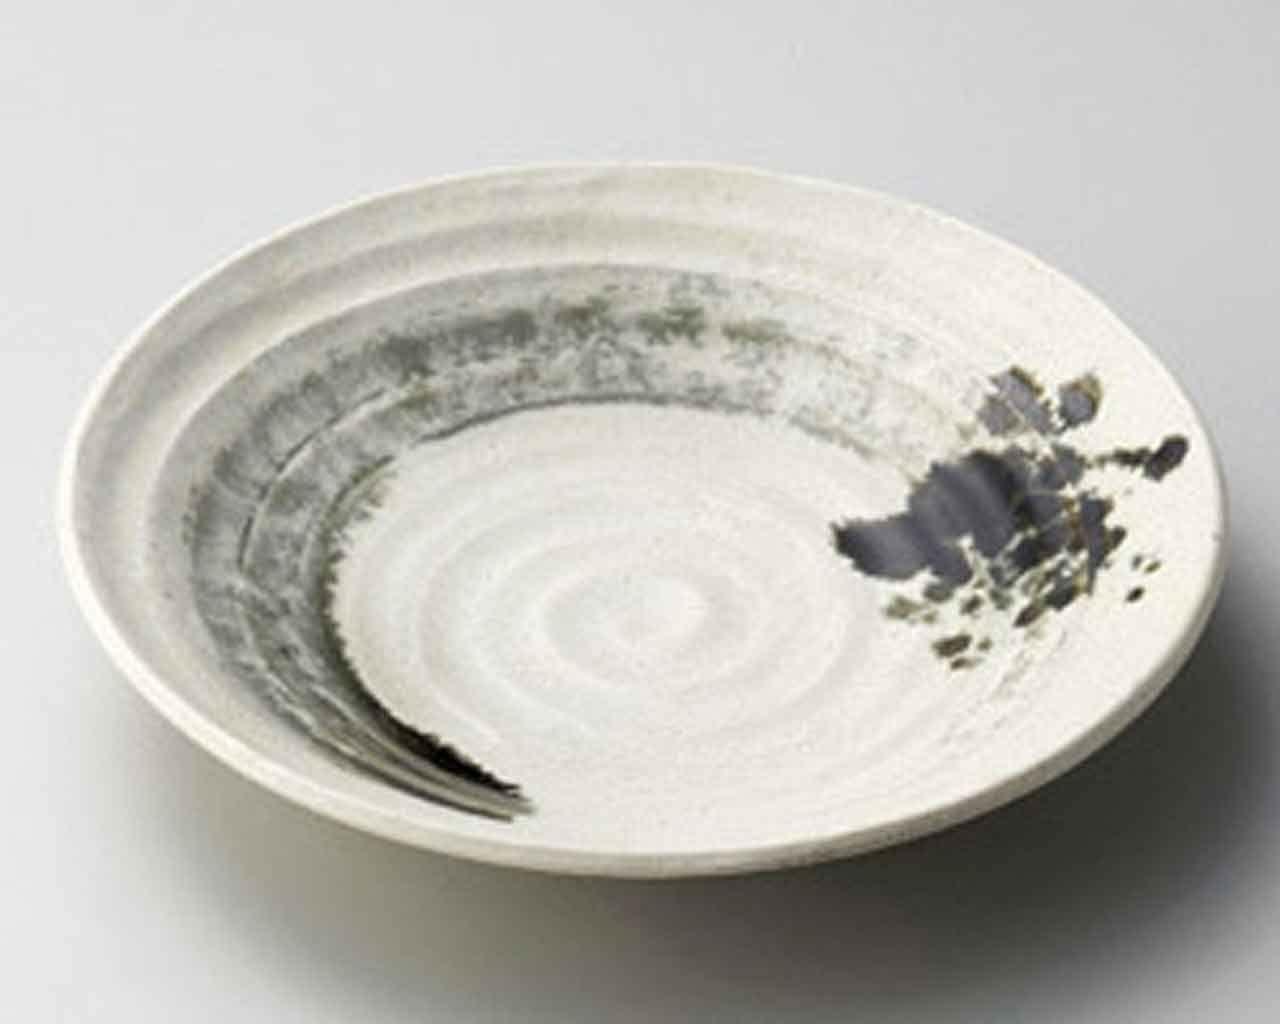 Arabiki 11.4inch Set of 2 SUSHI PLATES Beige porcelain Made in Japan